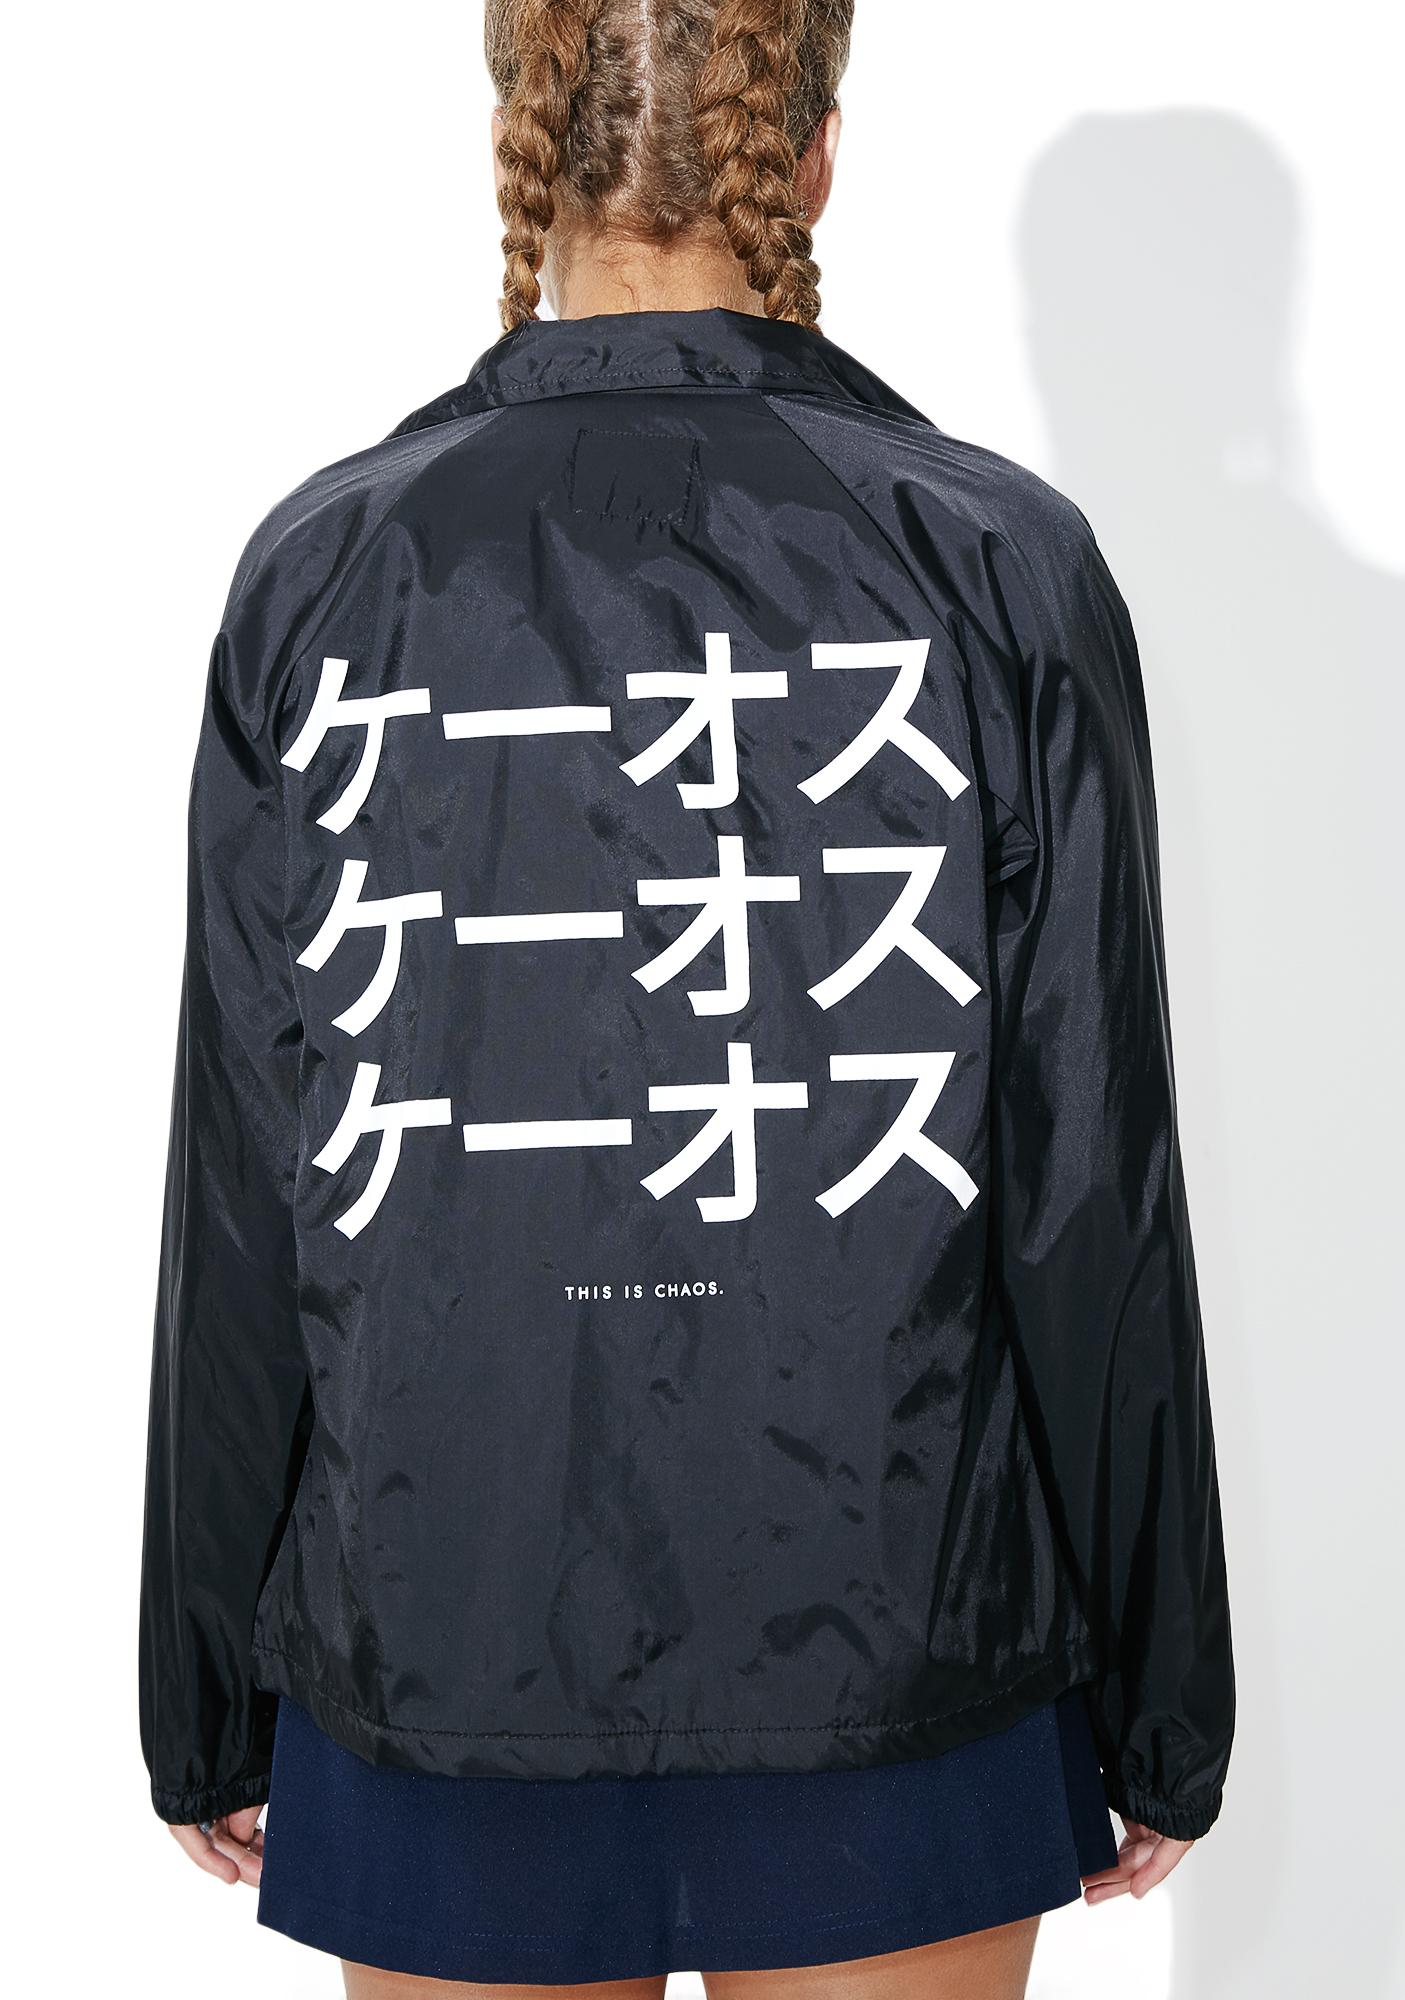 Perspectives Global Katakana Coaches Jacket